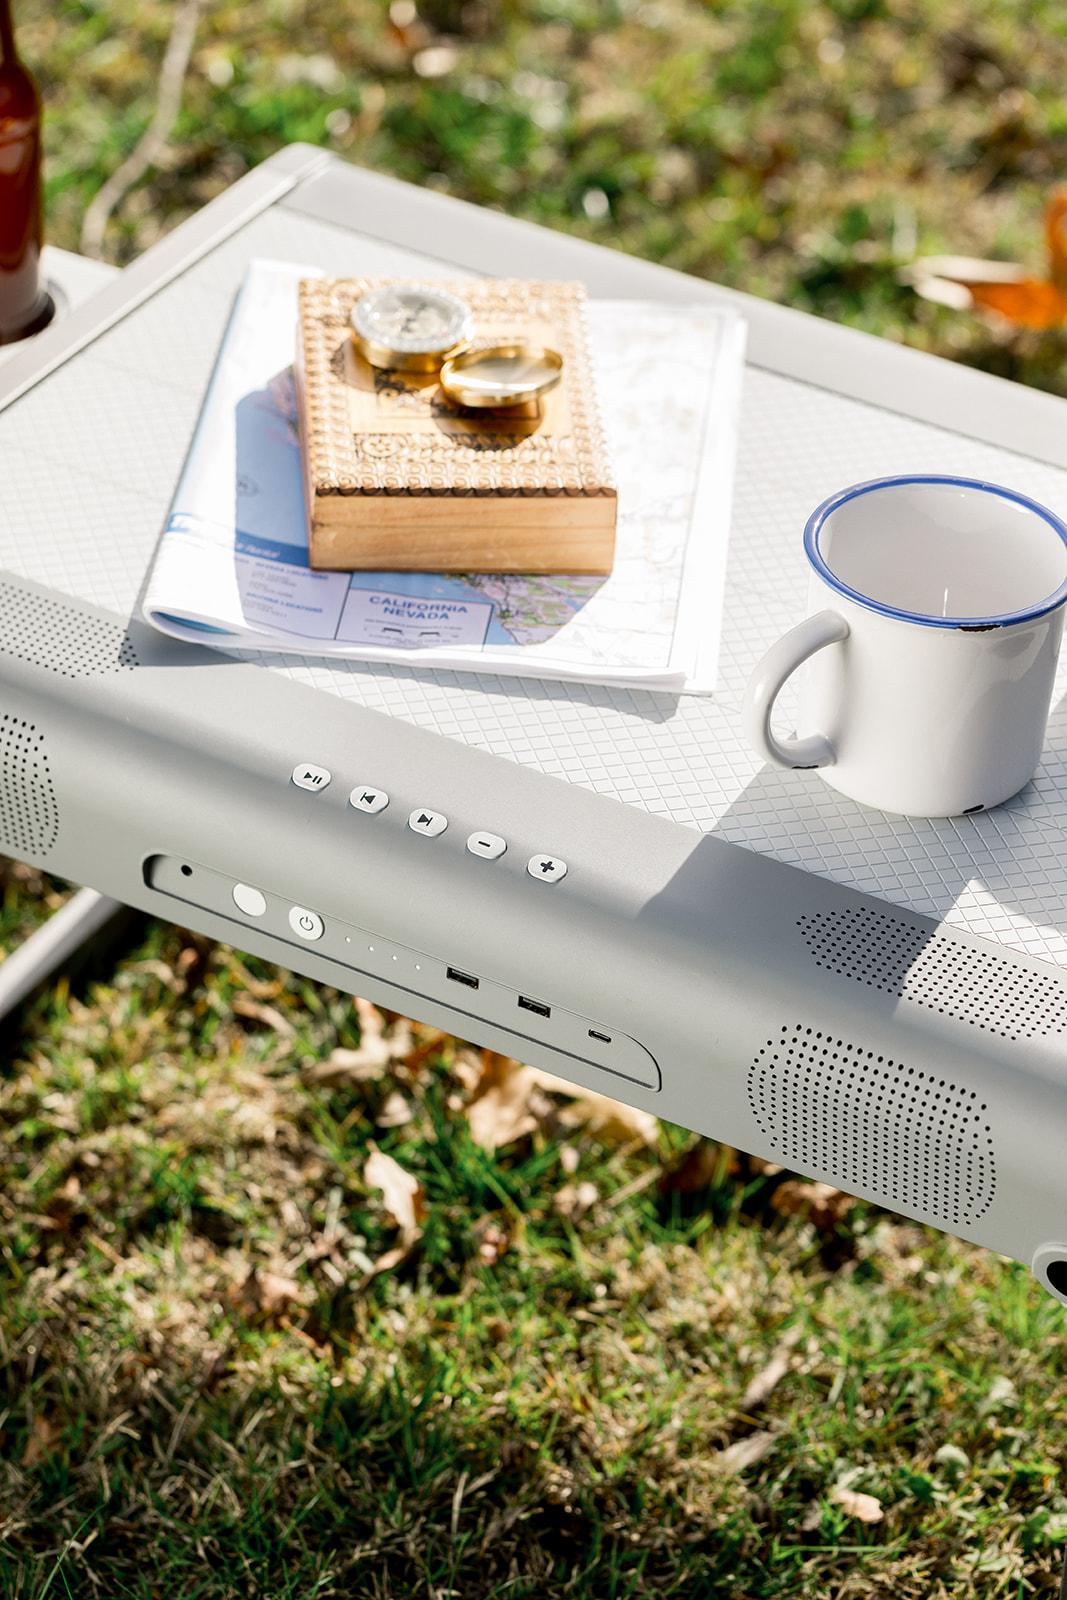 PorTable-Smart-Table-Product-Photos-189.jpg